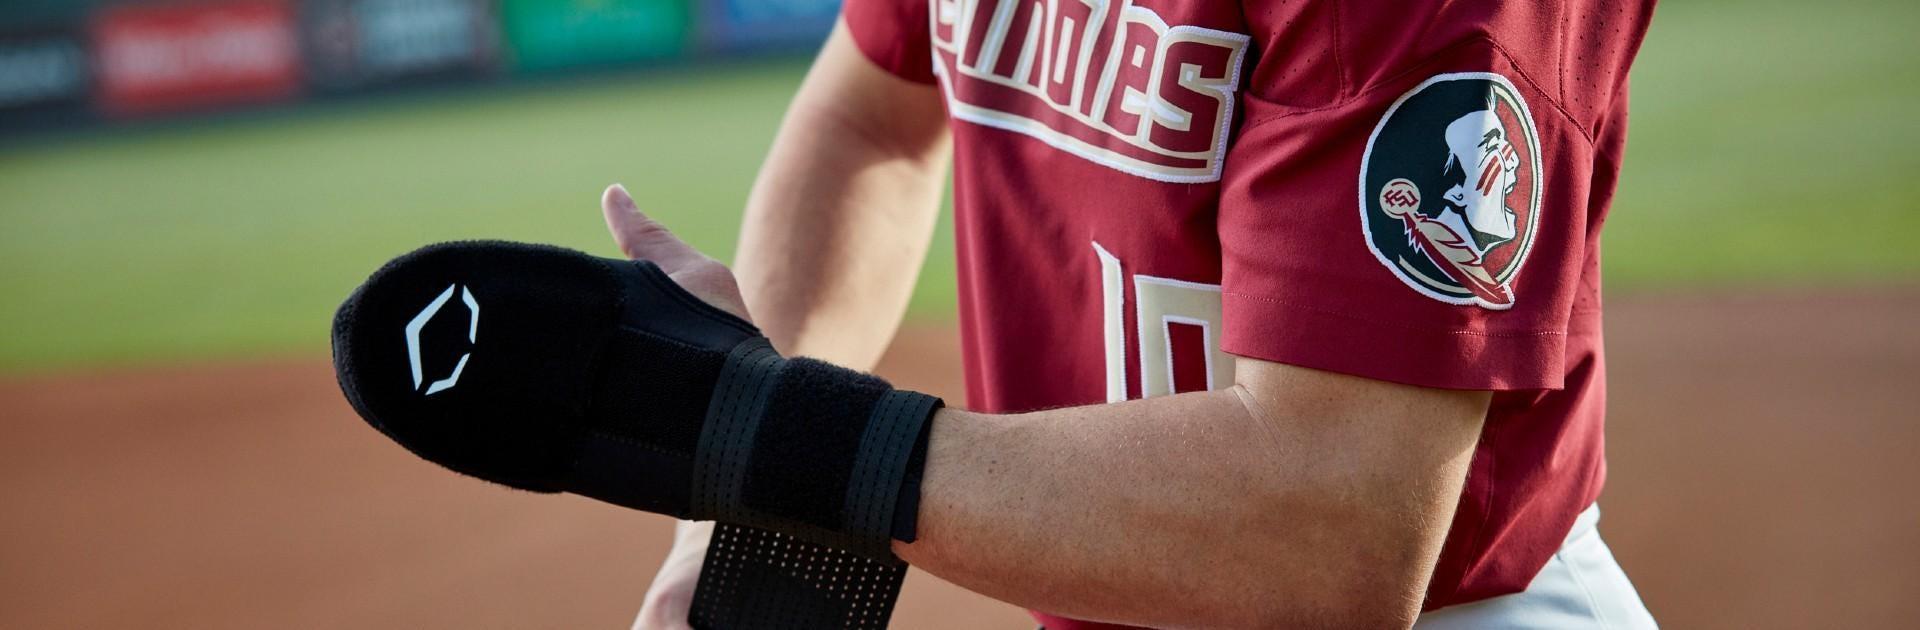 EvoShield-Sliding-Mitt-Baseball-Fastpitch-Softball